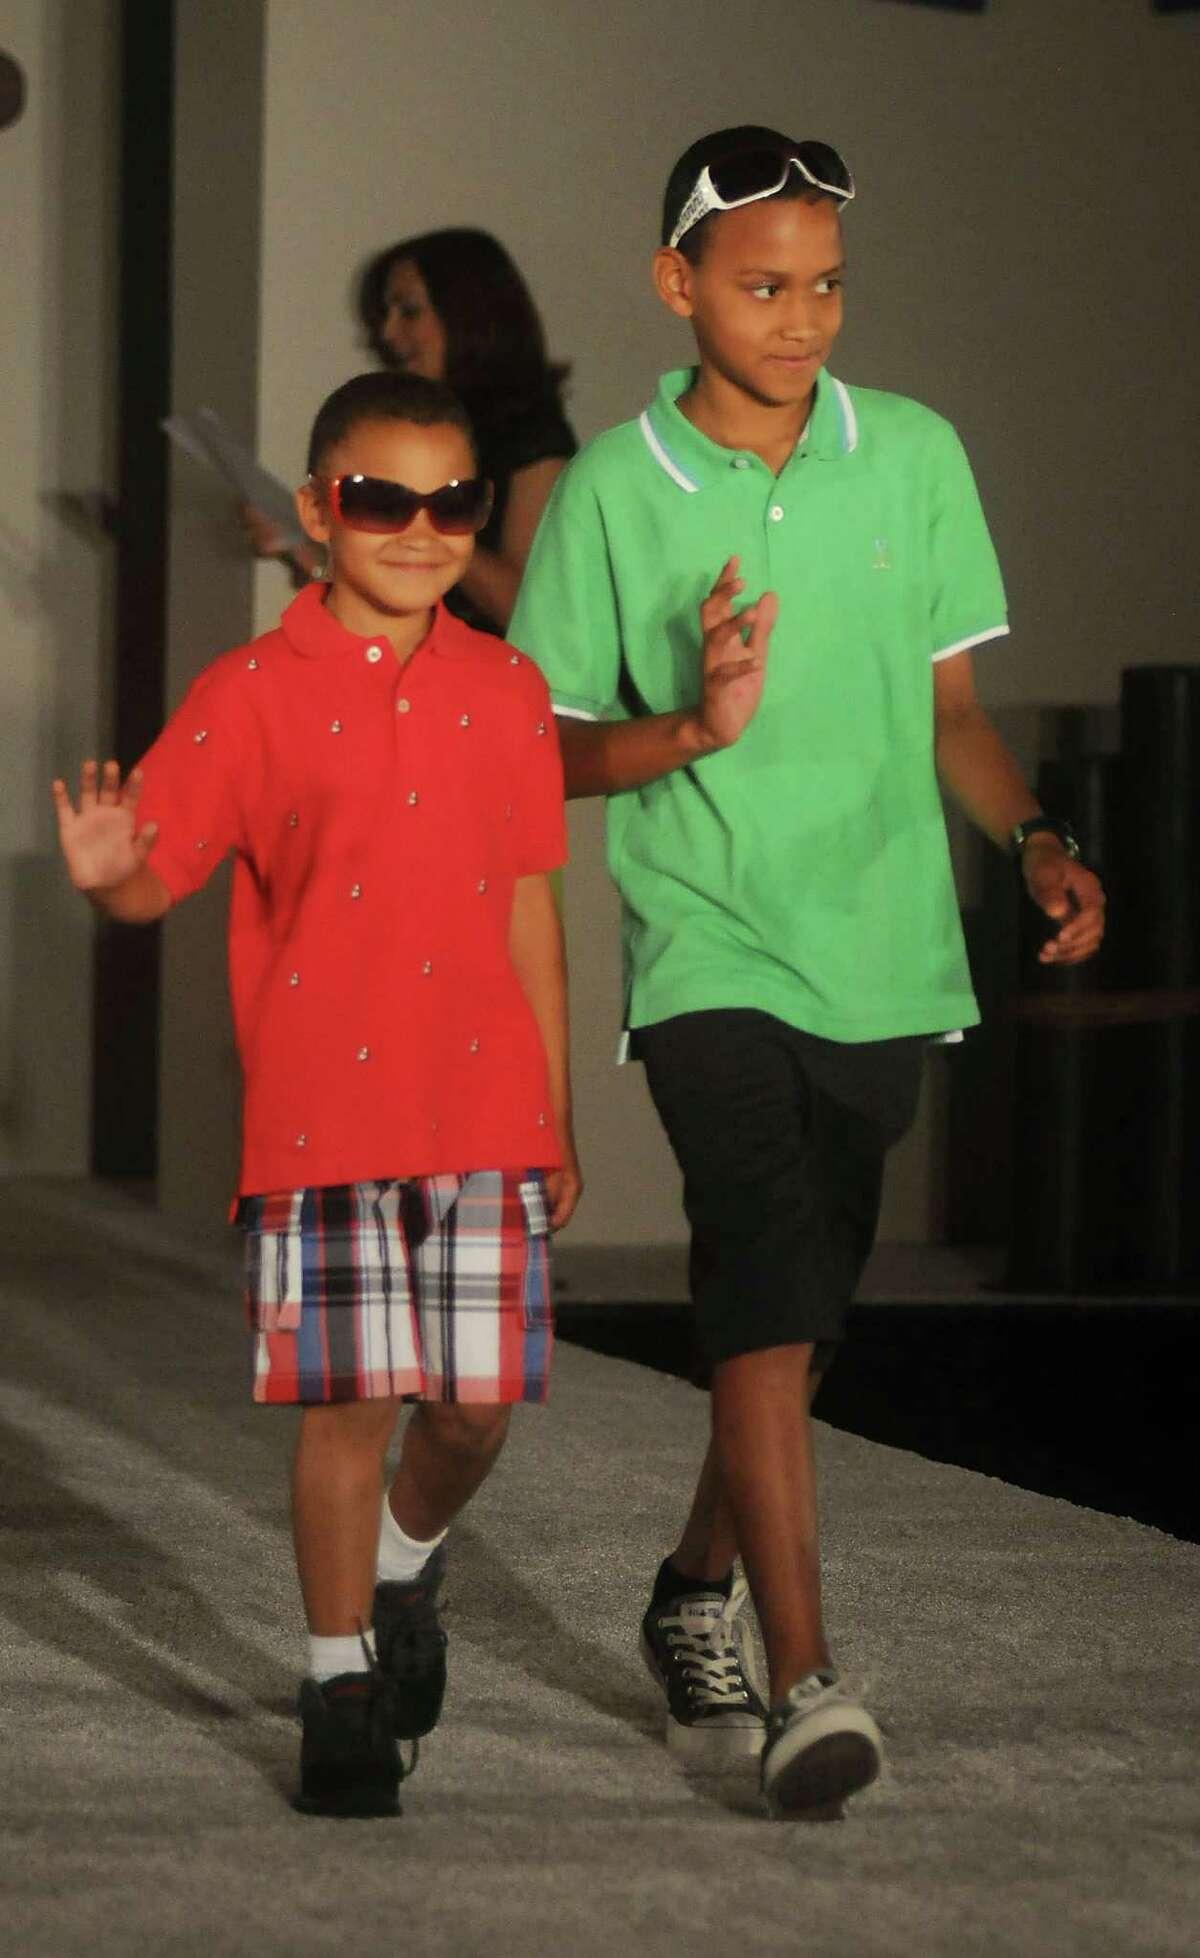 Boys No. 9 Clothes